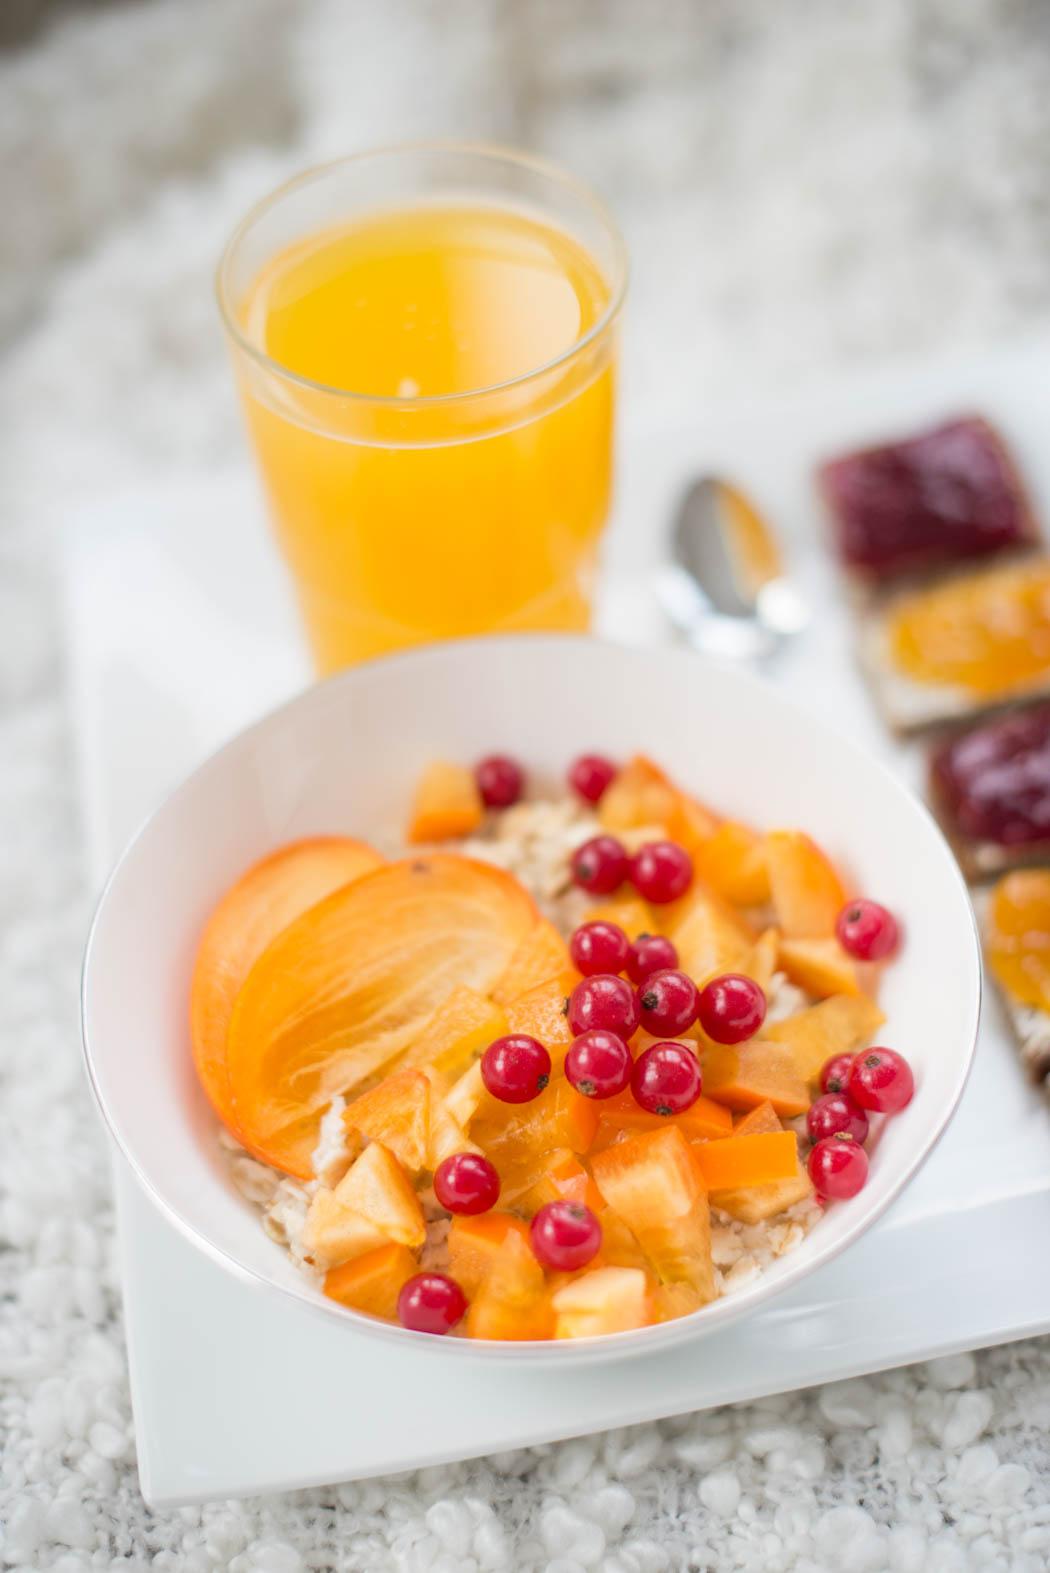 Lindarella-Foodblogger-Frühstücksinspiration-vegan-healthy-4